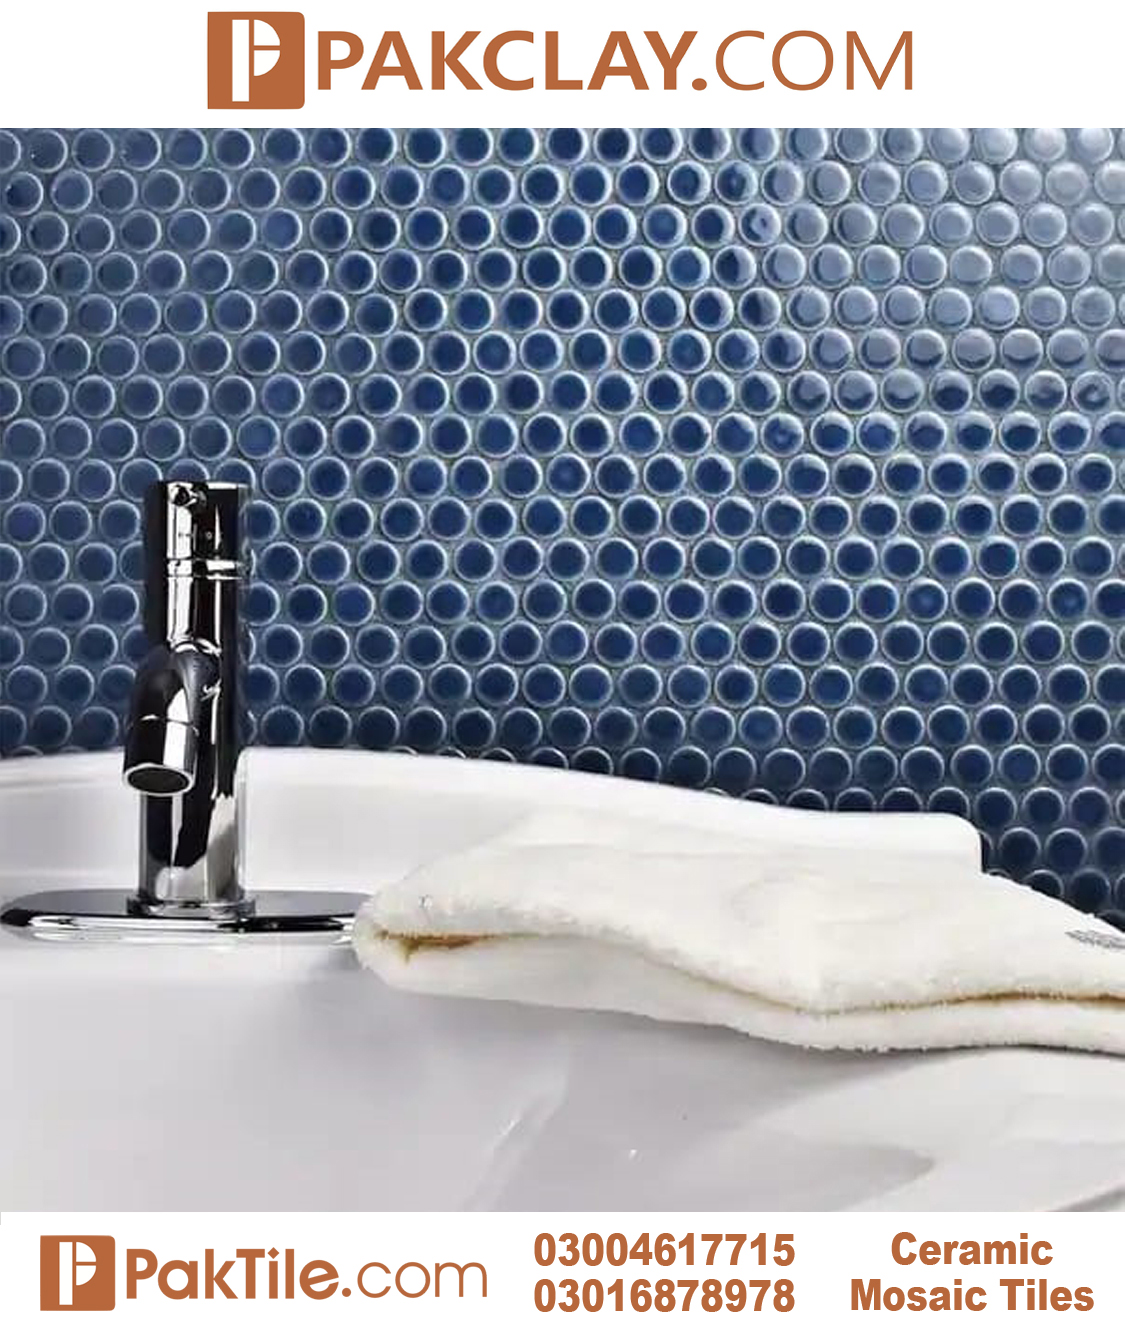 Blue Color Ceramic Bathroom Wall Tiles in Pakistan